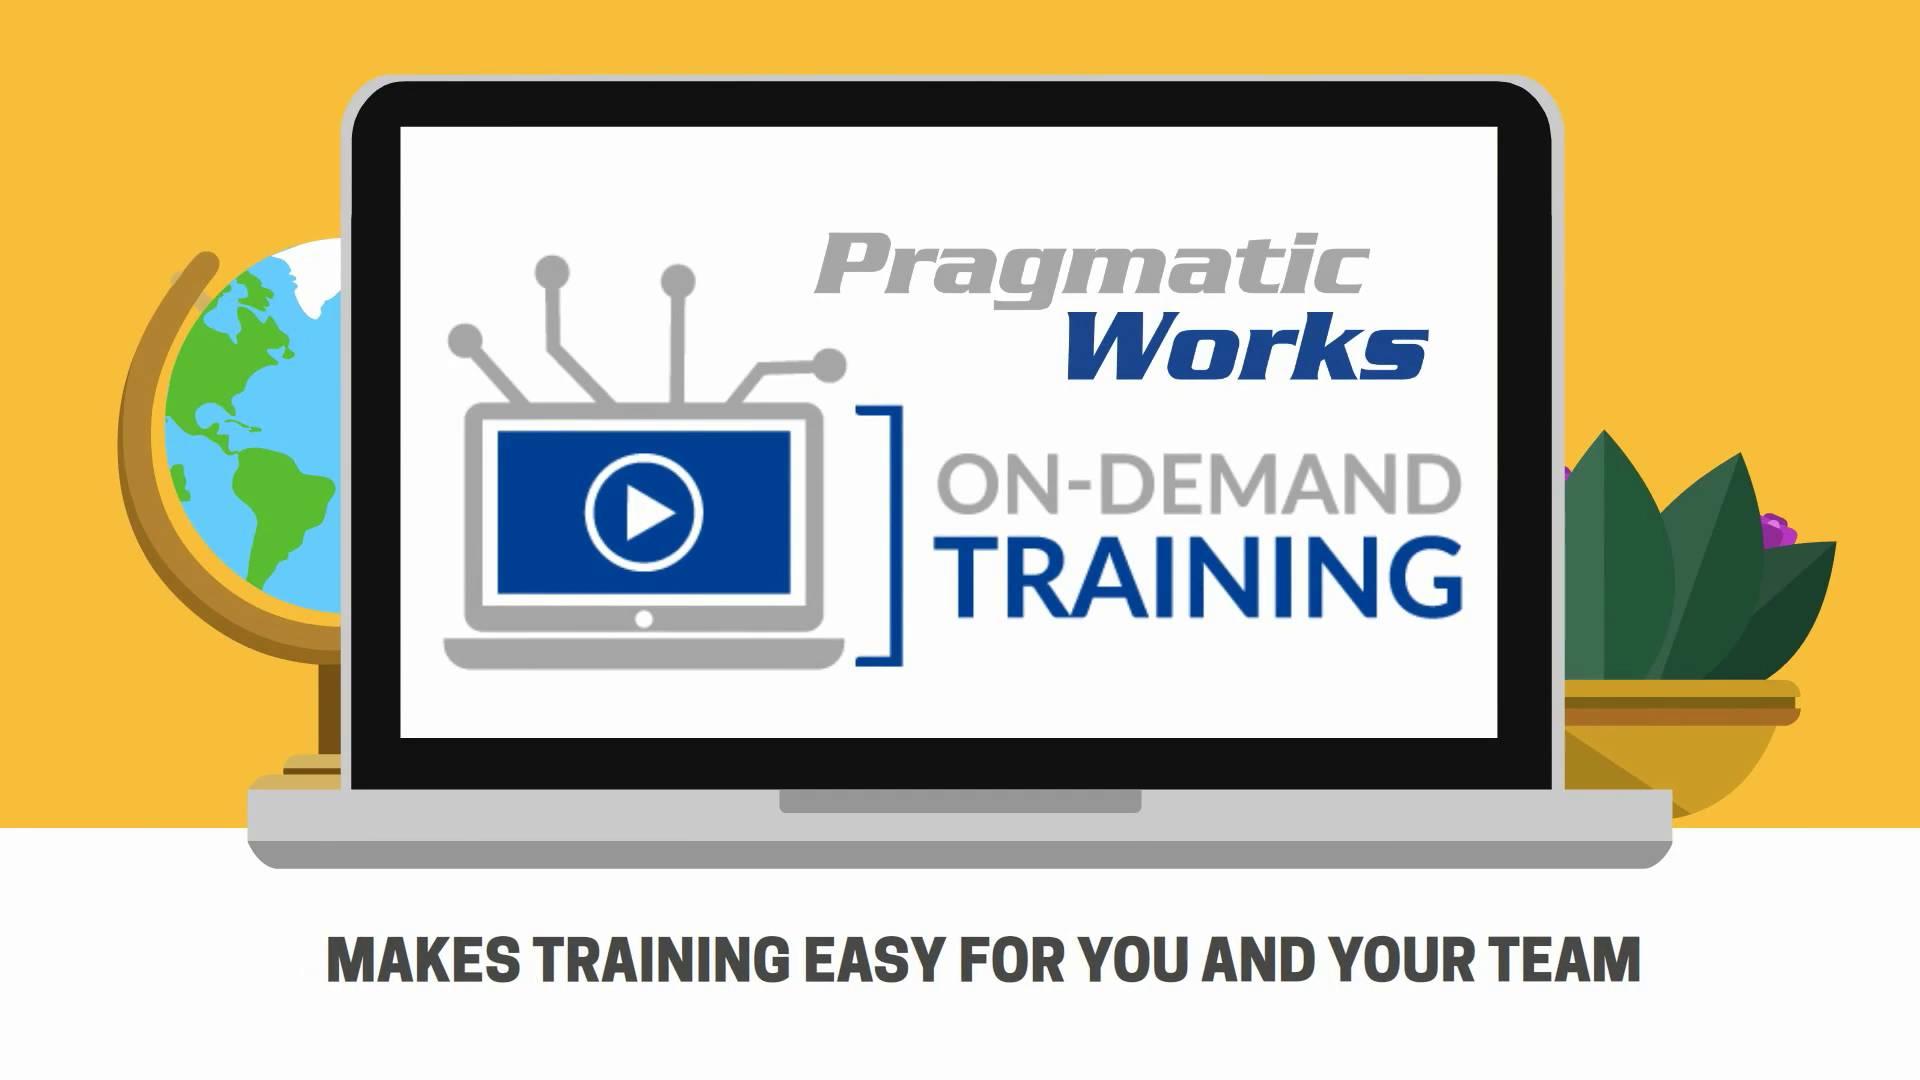 Pragmatic Works ODT - YouTube